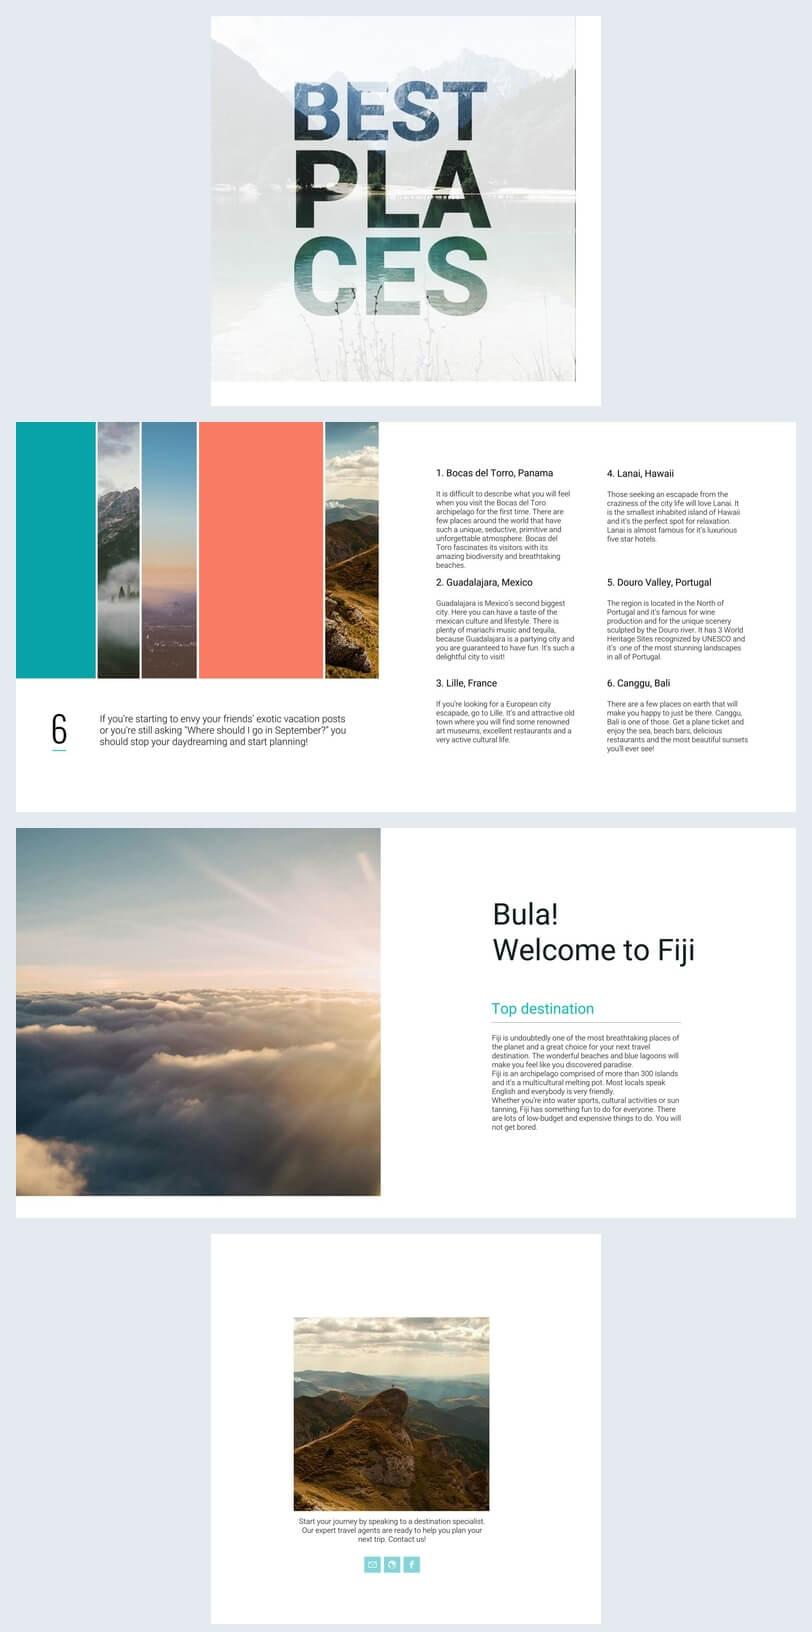 Beautiful Travel Guide Brochure Template – Flipsnack With Travel Guide Brochure Template